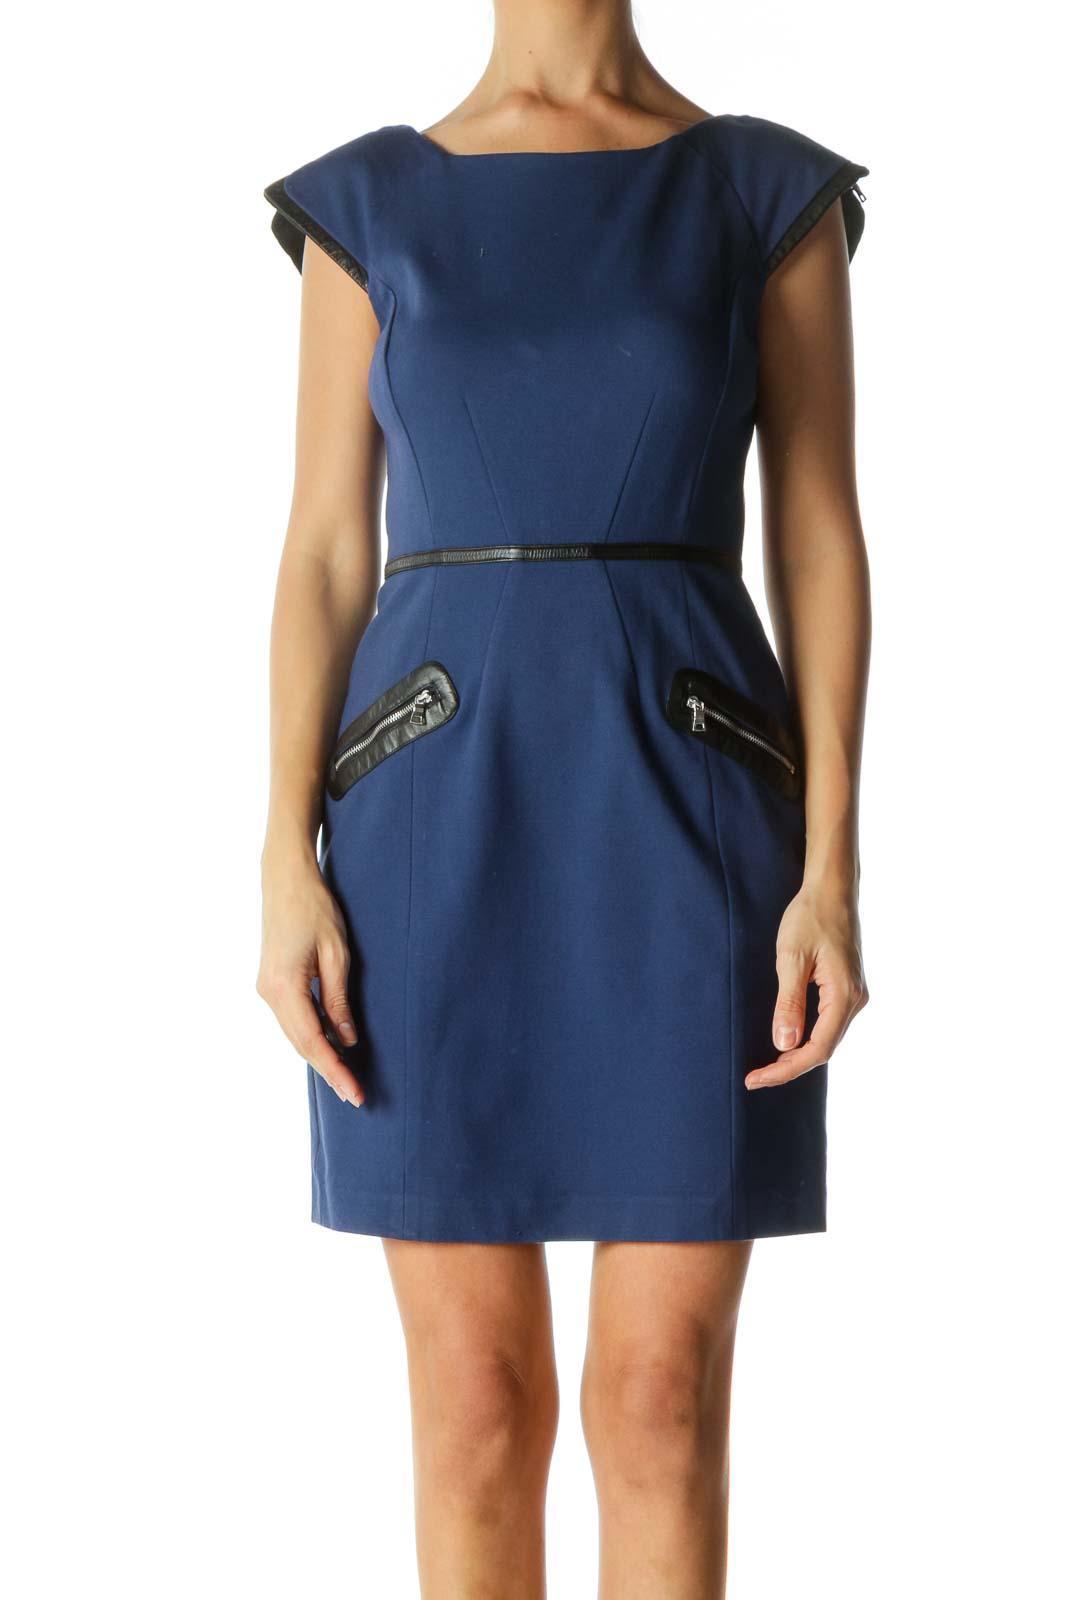 Blue and Black Zippered Back Sheath Dress Front